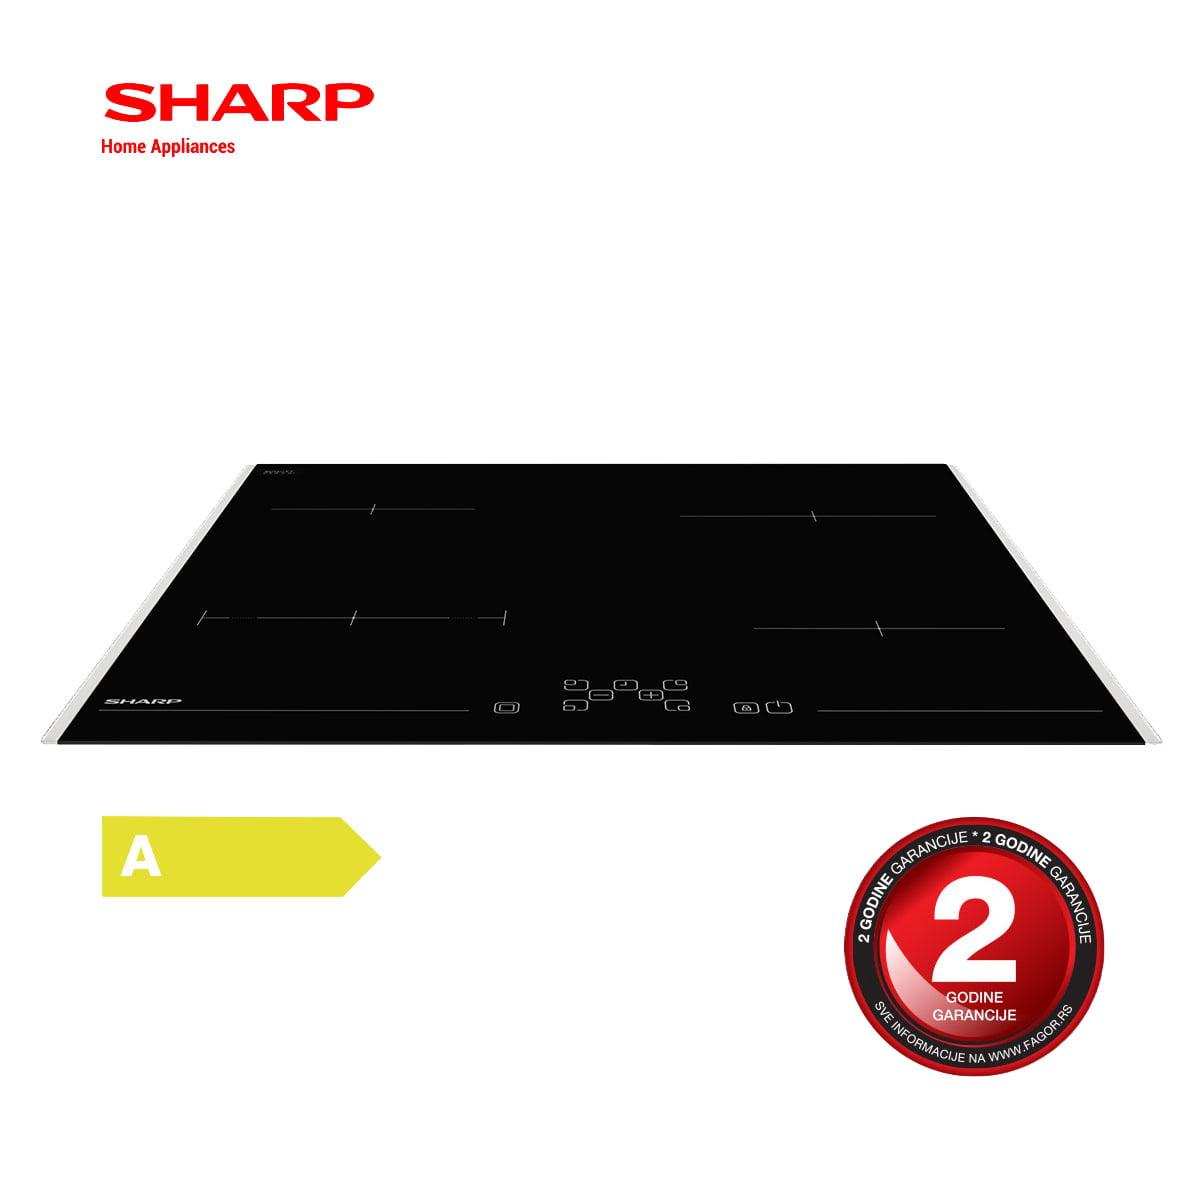 Ugradna ploča - Sharp KH-6V08FT00 ploca odgore 1